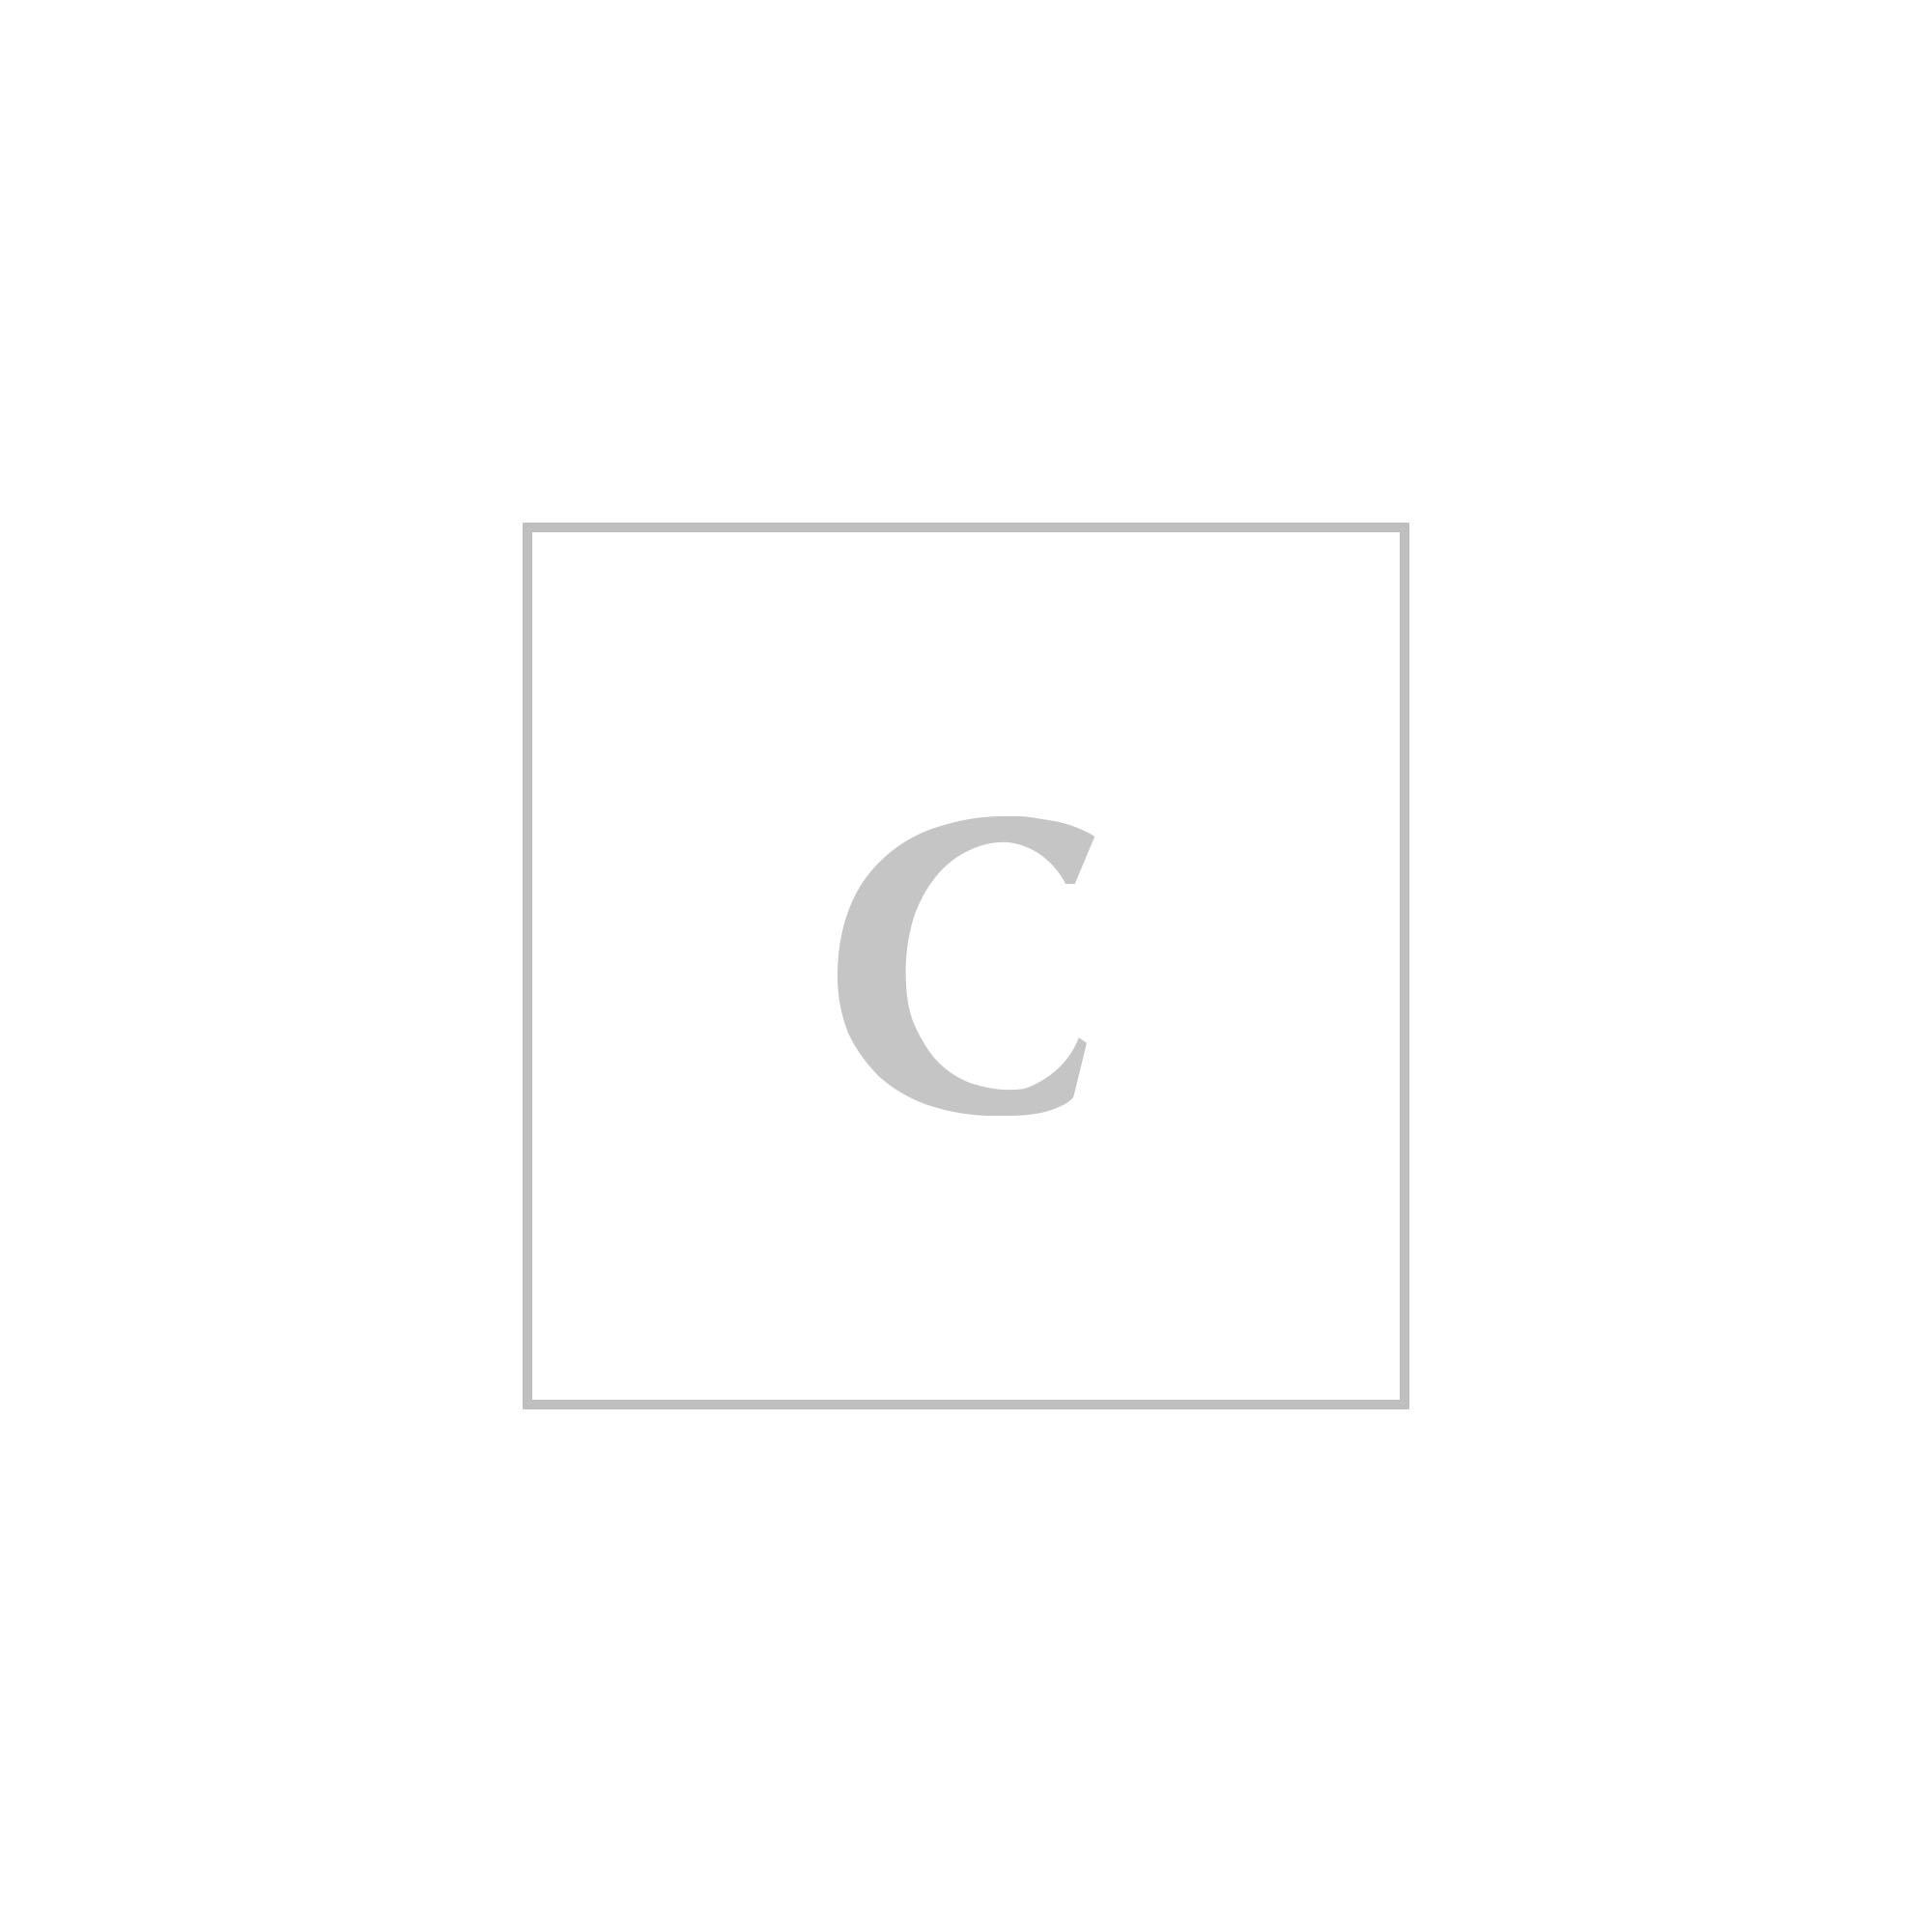 off-white borse uomo camera bag logo